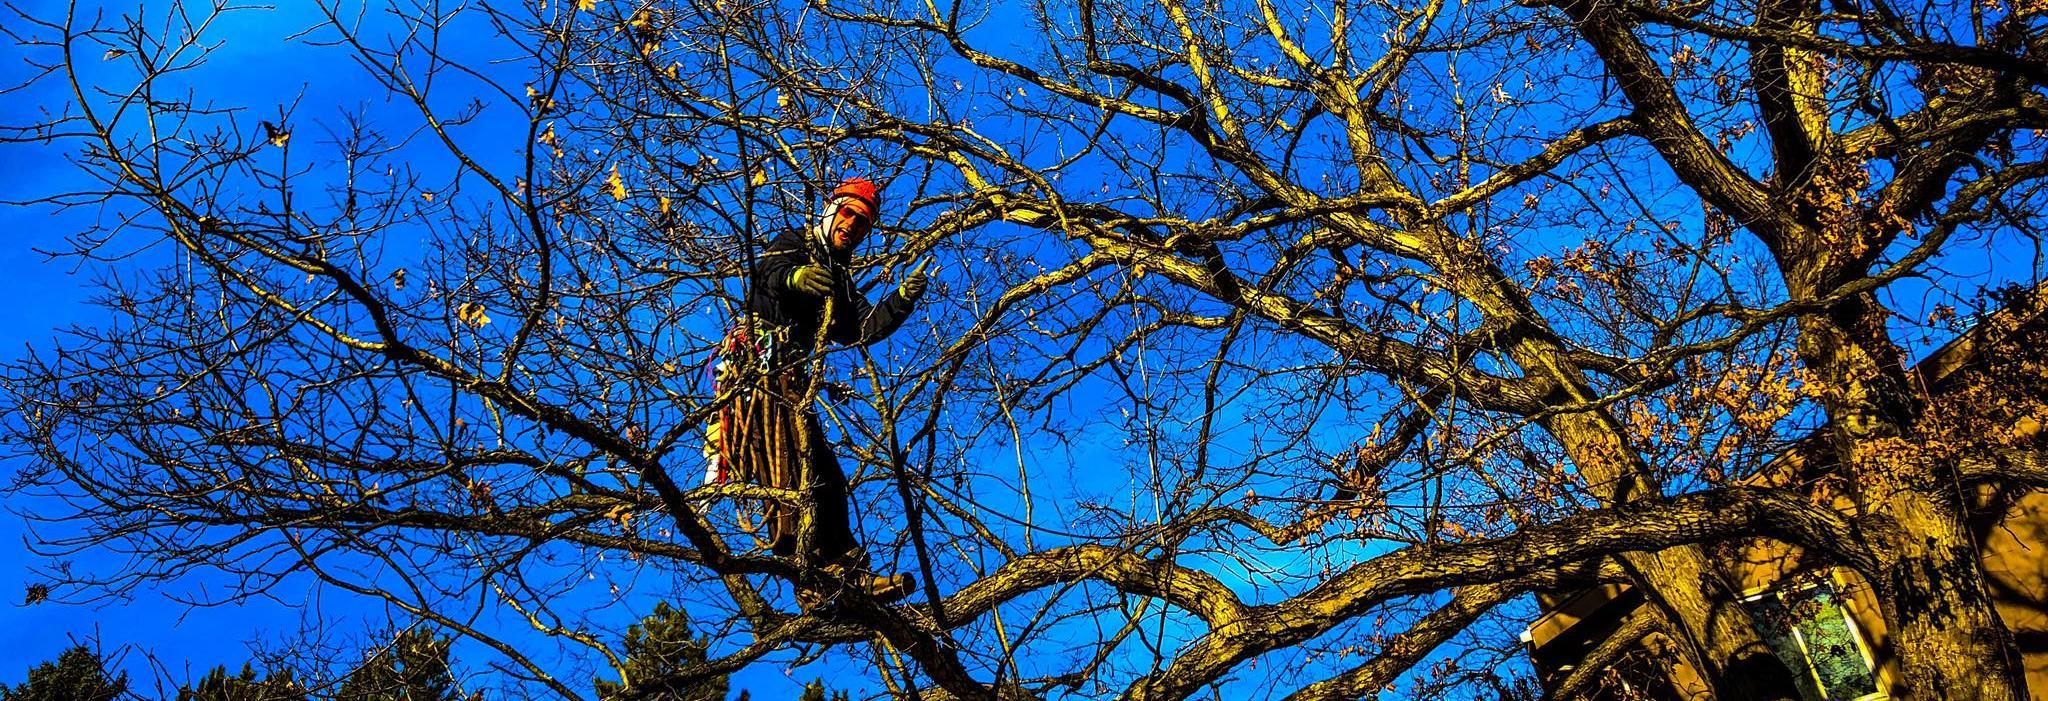 Greenman tree and landscape services Waukesha Milwaukee WI